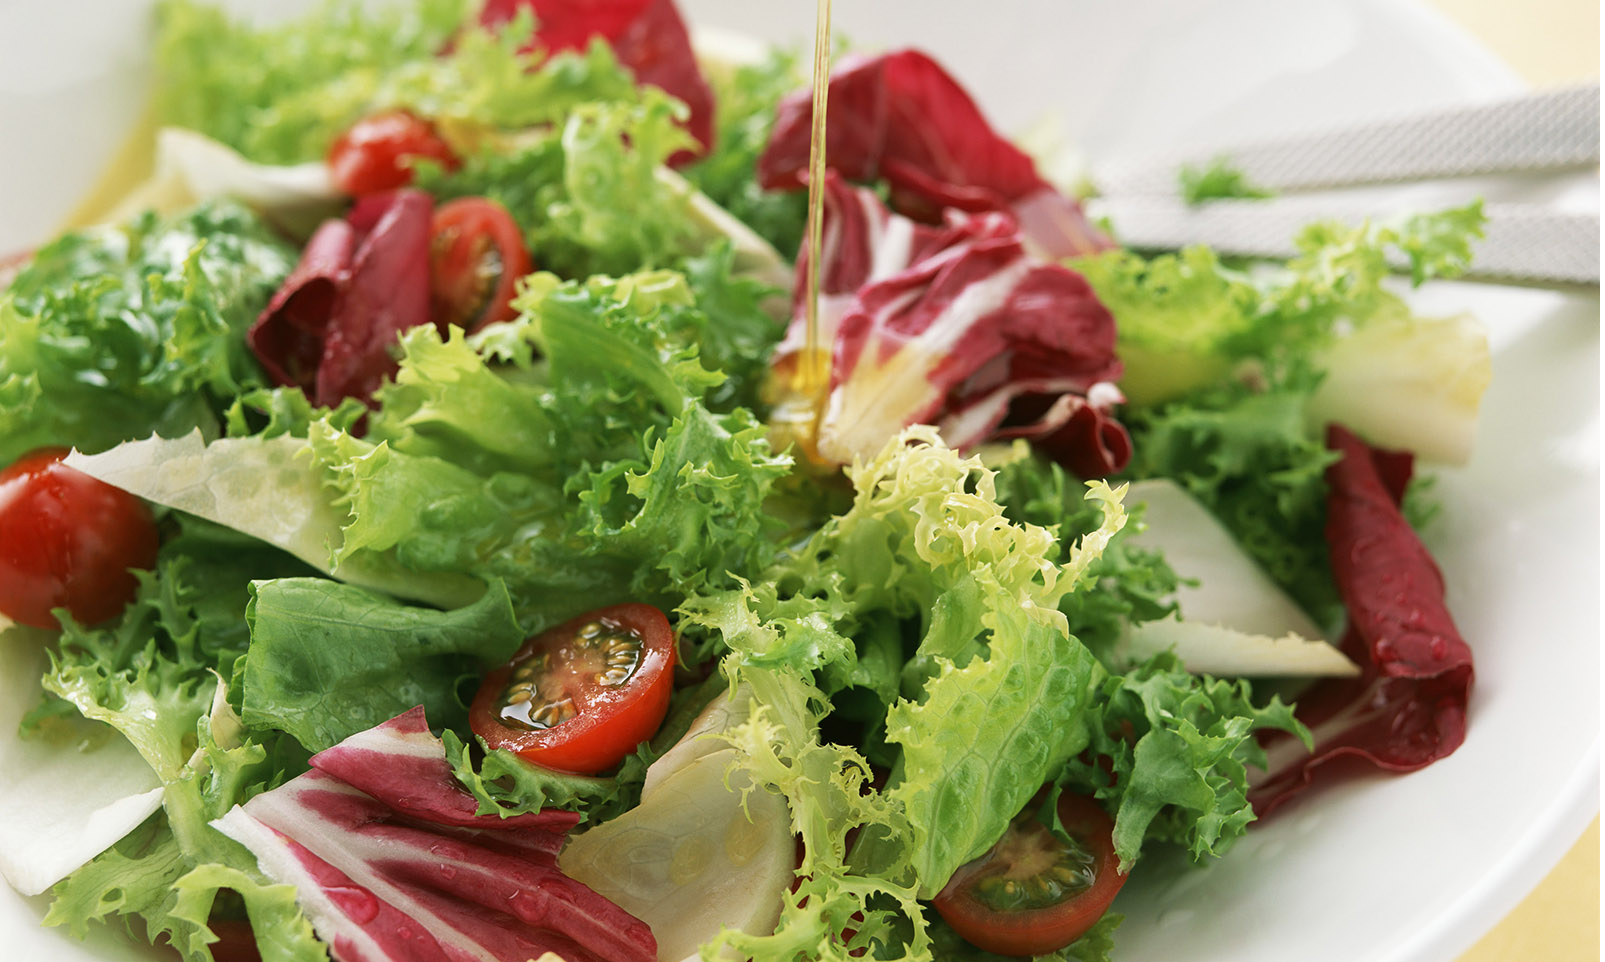 Le insalati